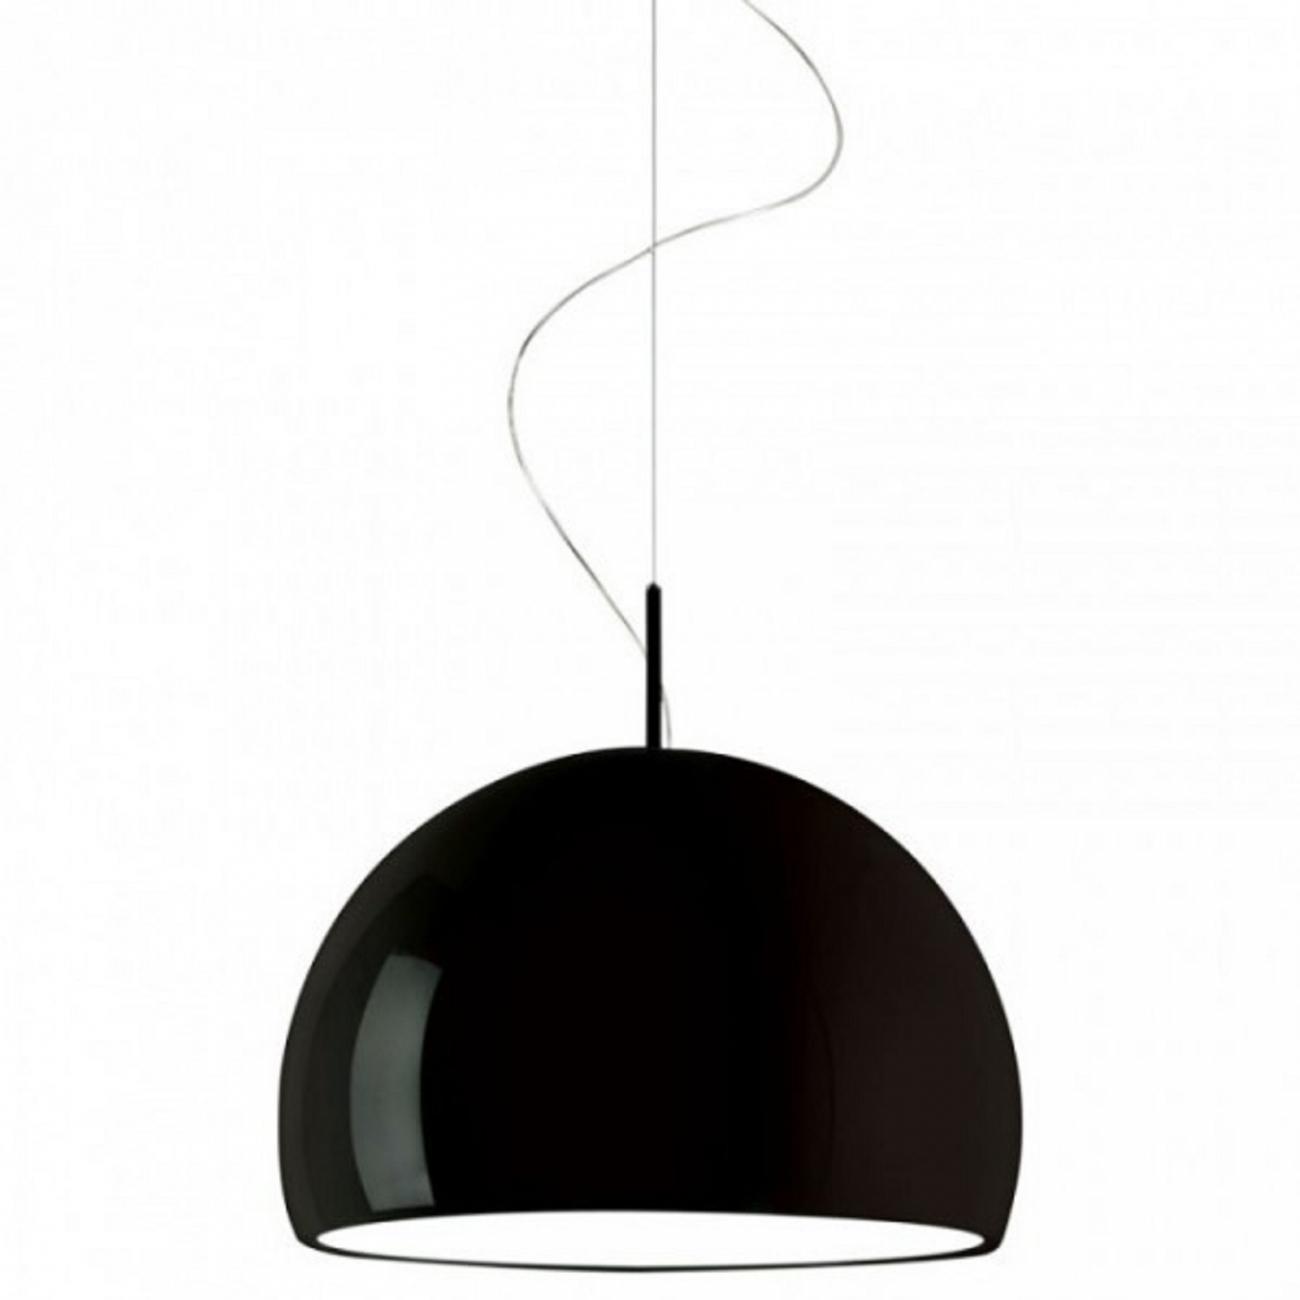 PRANDINA BILUNA S7 SUSPENDED LAMP GLOSSY BLACK